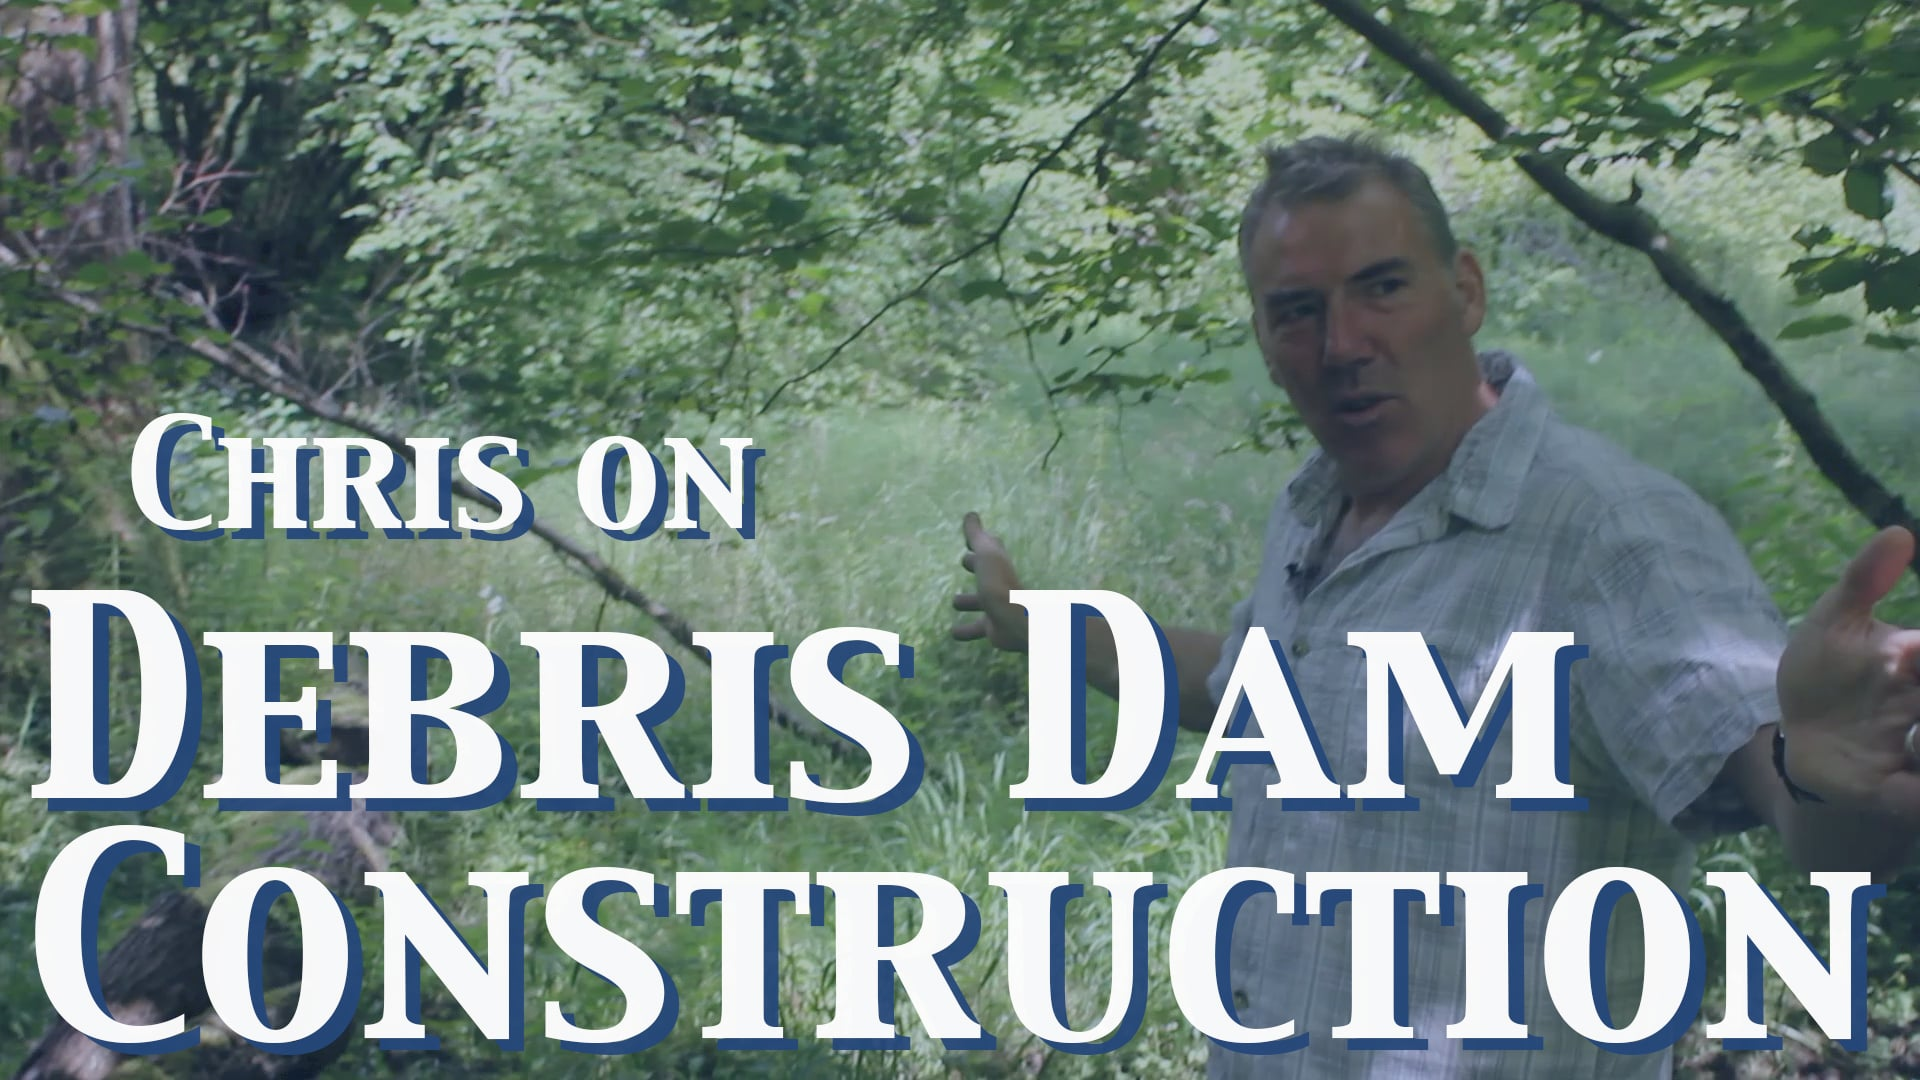 Chris on Debris Dam Construction